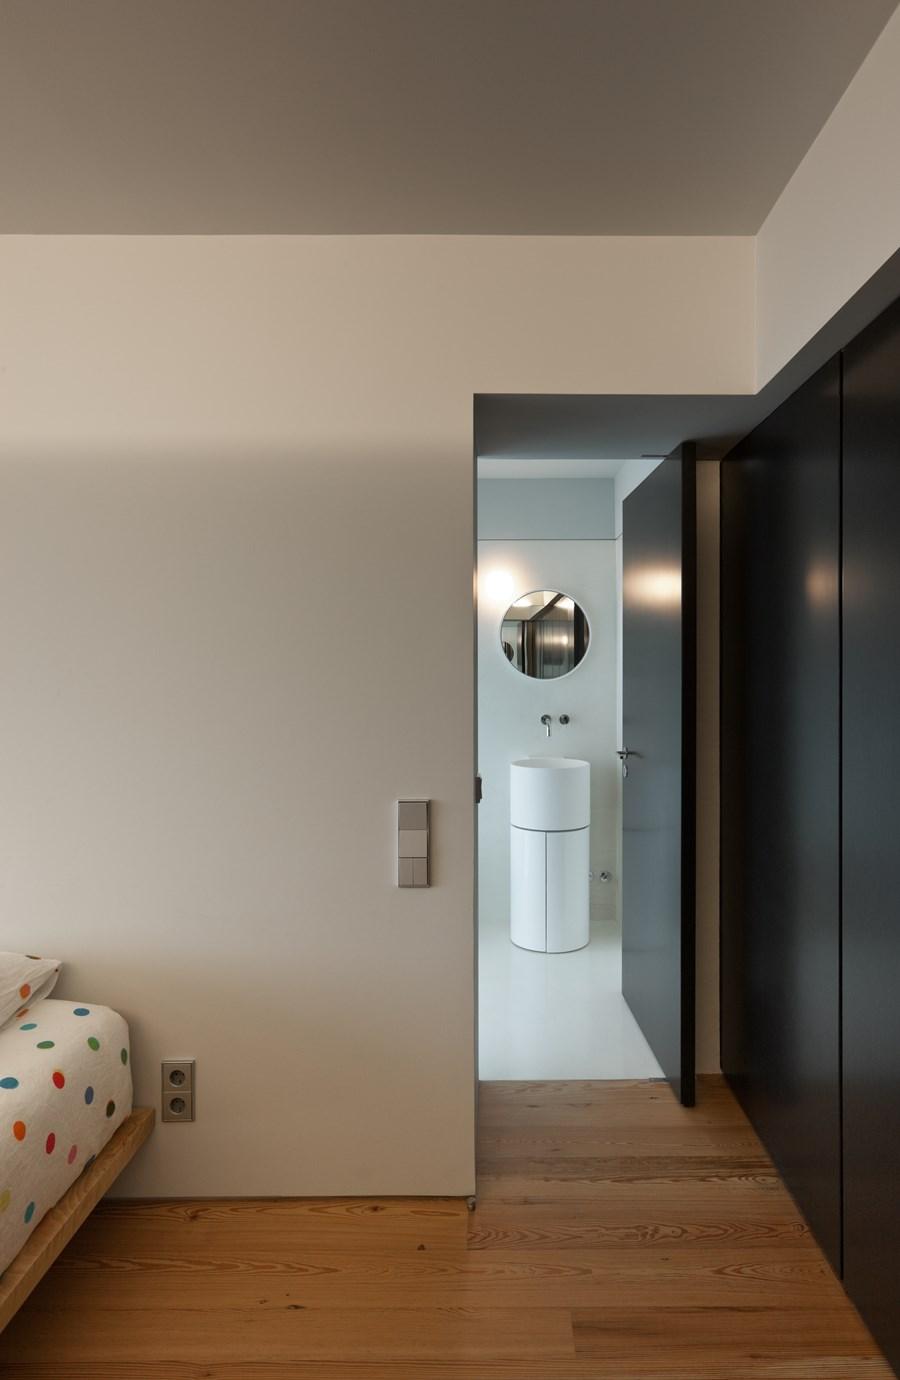 Rehabilitation of an apartment by Correia Ragazzi Arquitectos 22